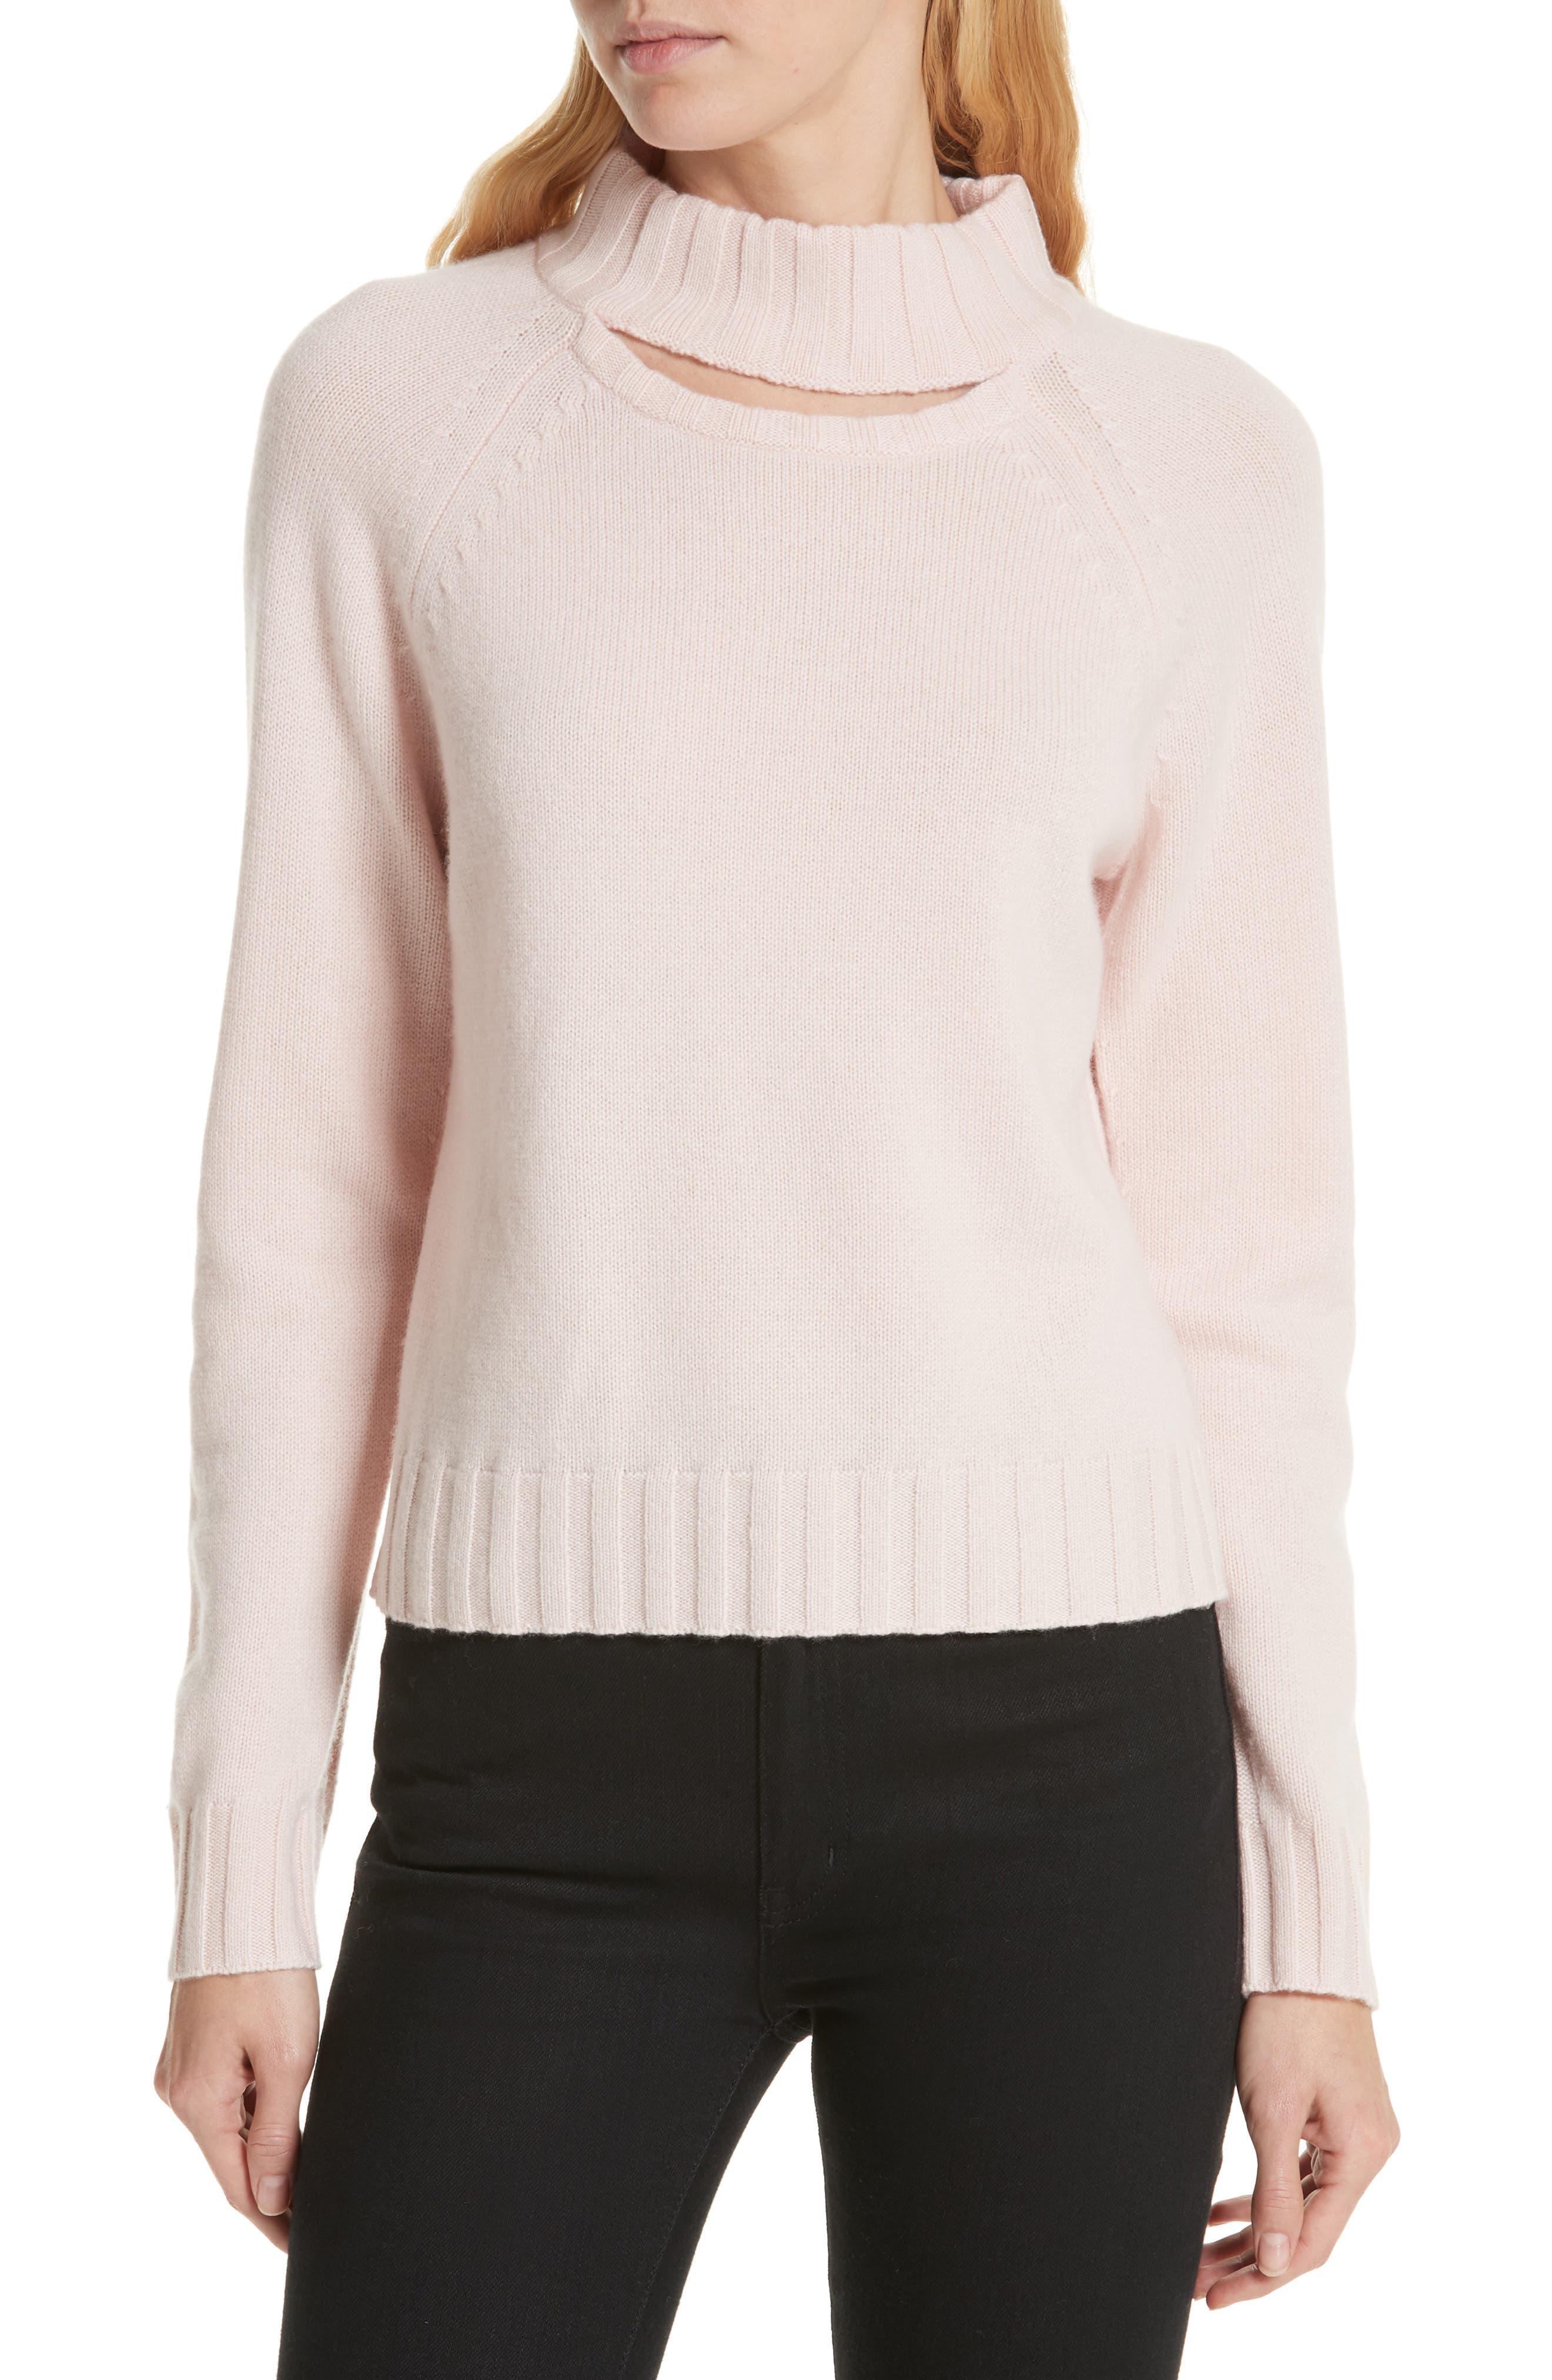 Equipment Cutout Detail Mock Neck Wool Cashmere Sweater, Pink